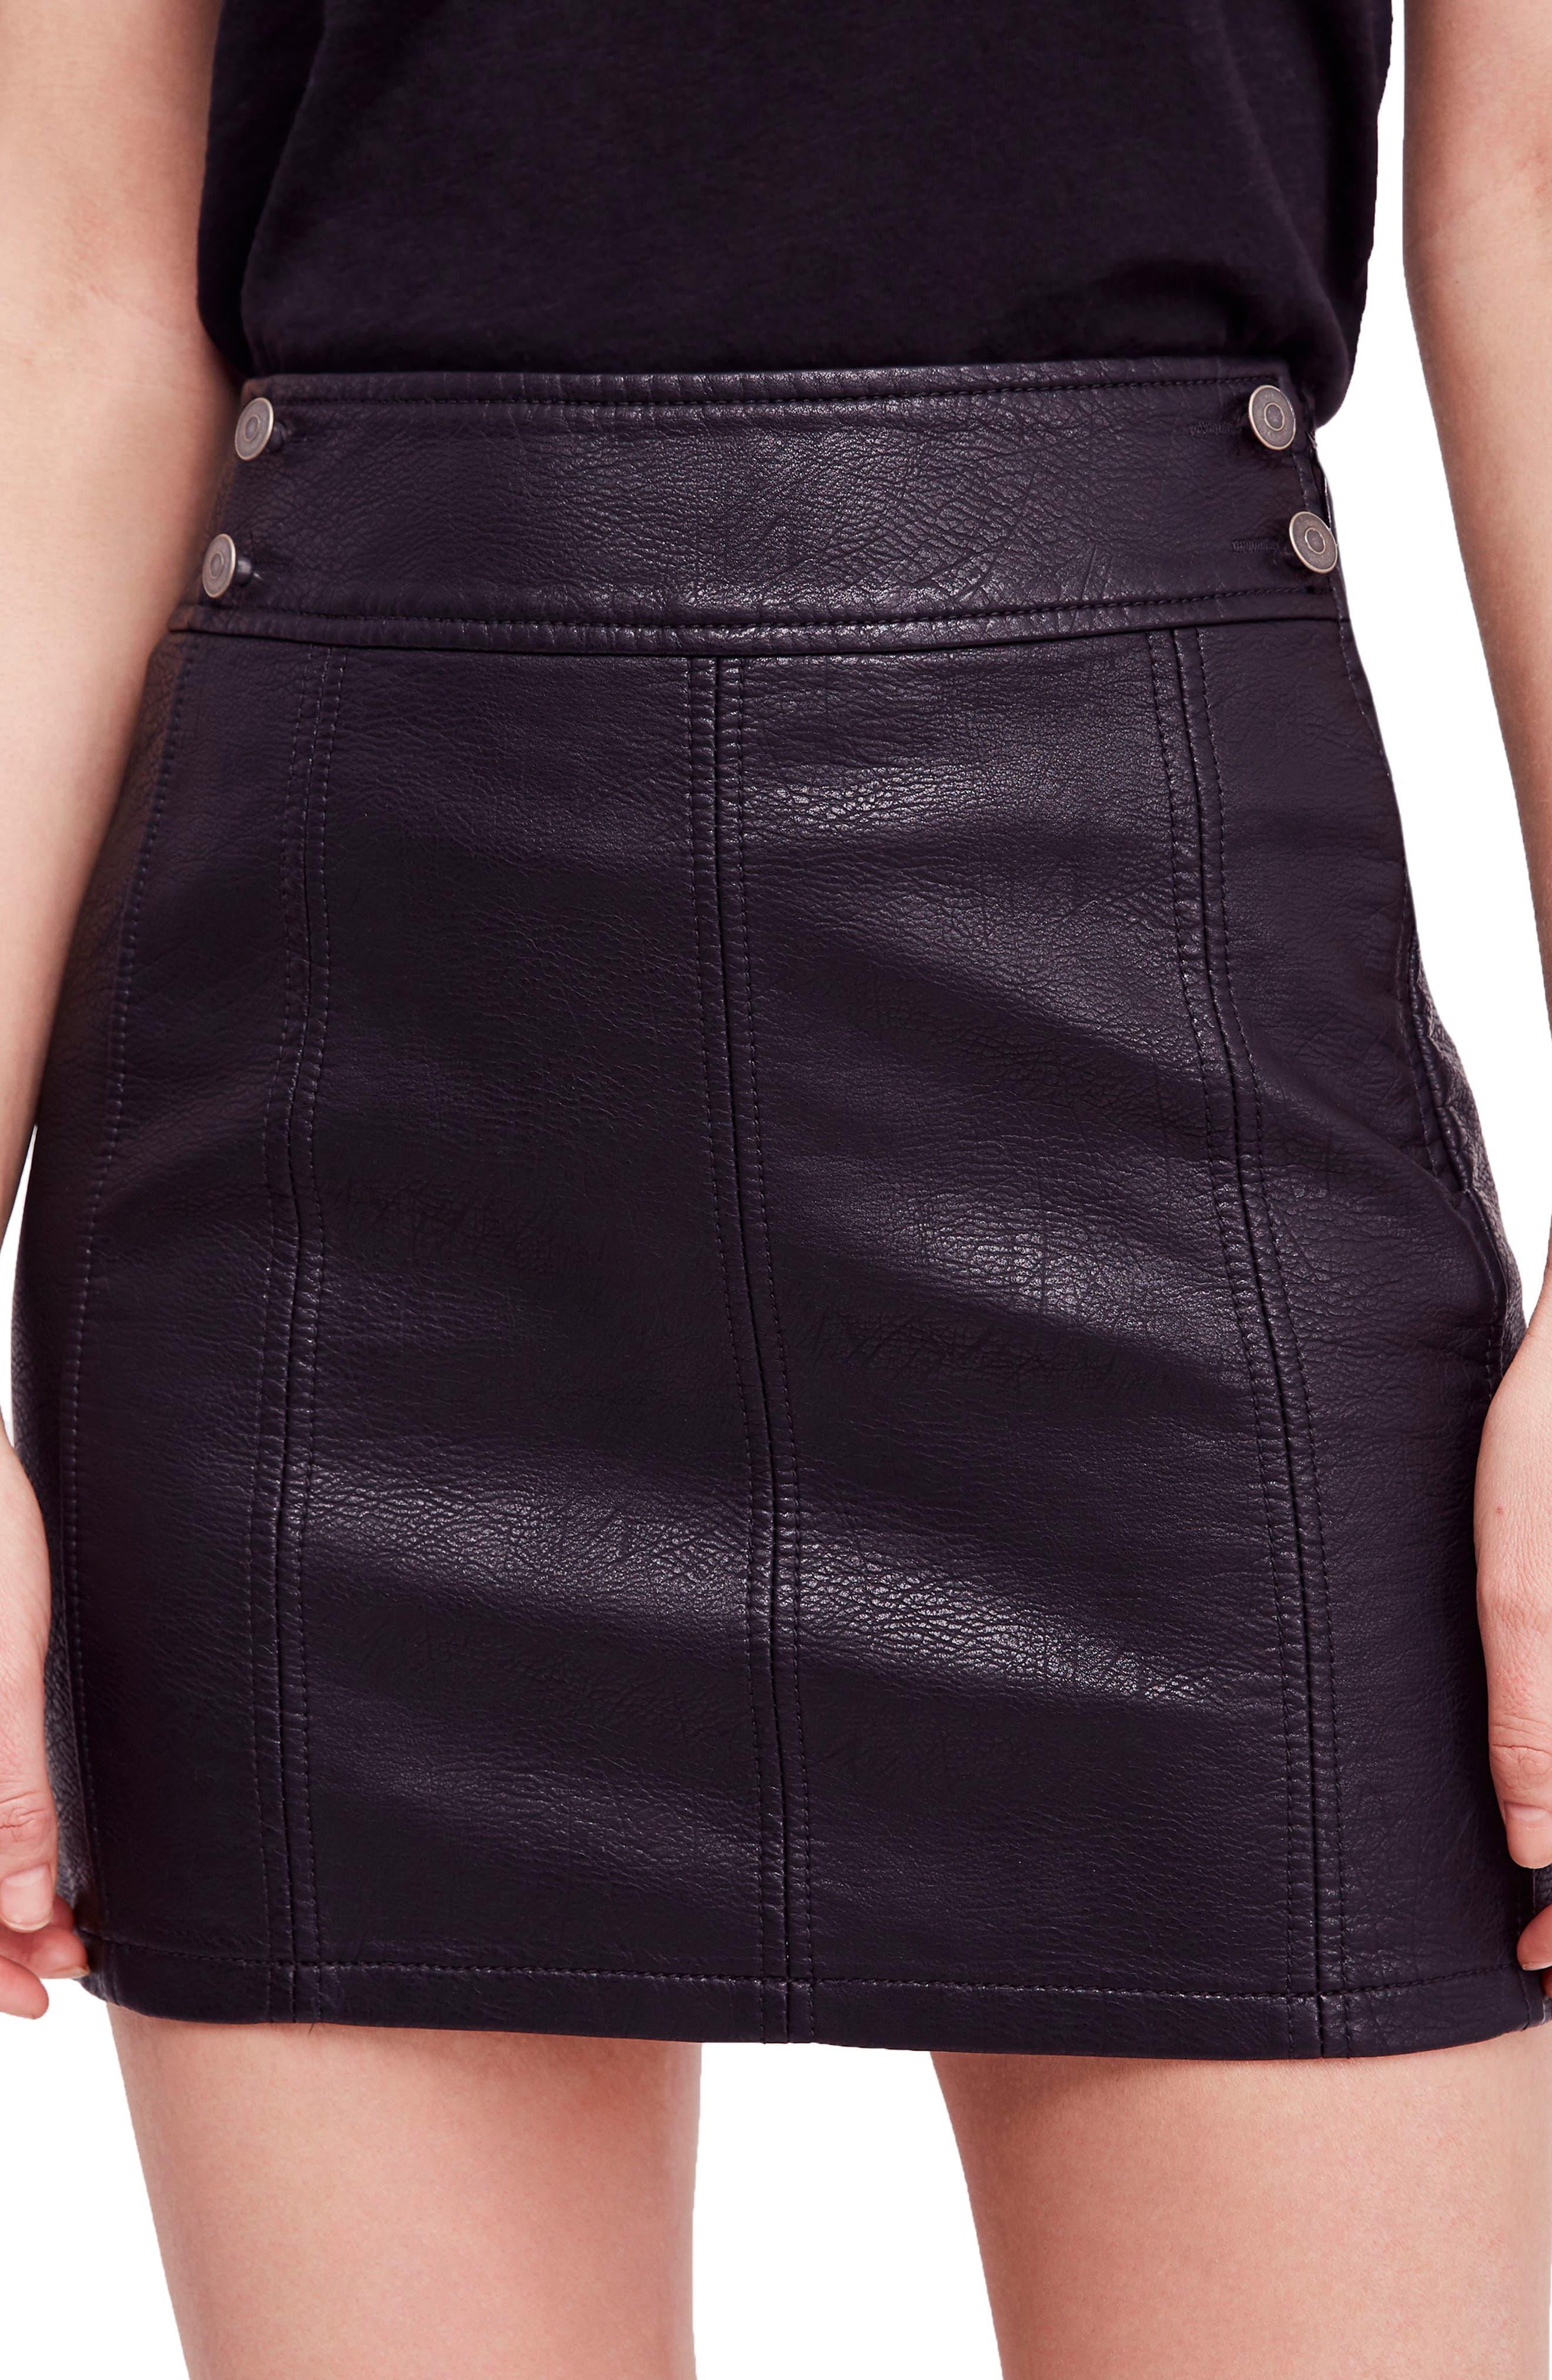 Retro Faux Leather Body-Con Miniskirt,                             Main thumbnail 1, color,                             001